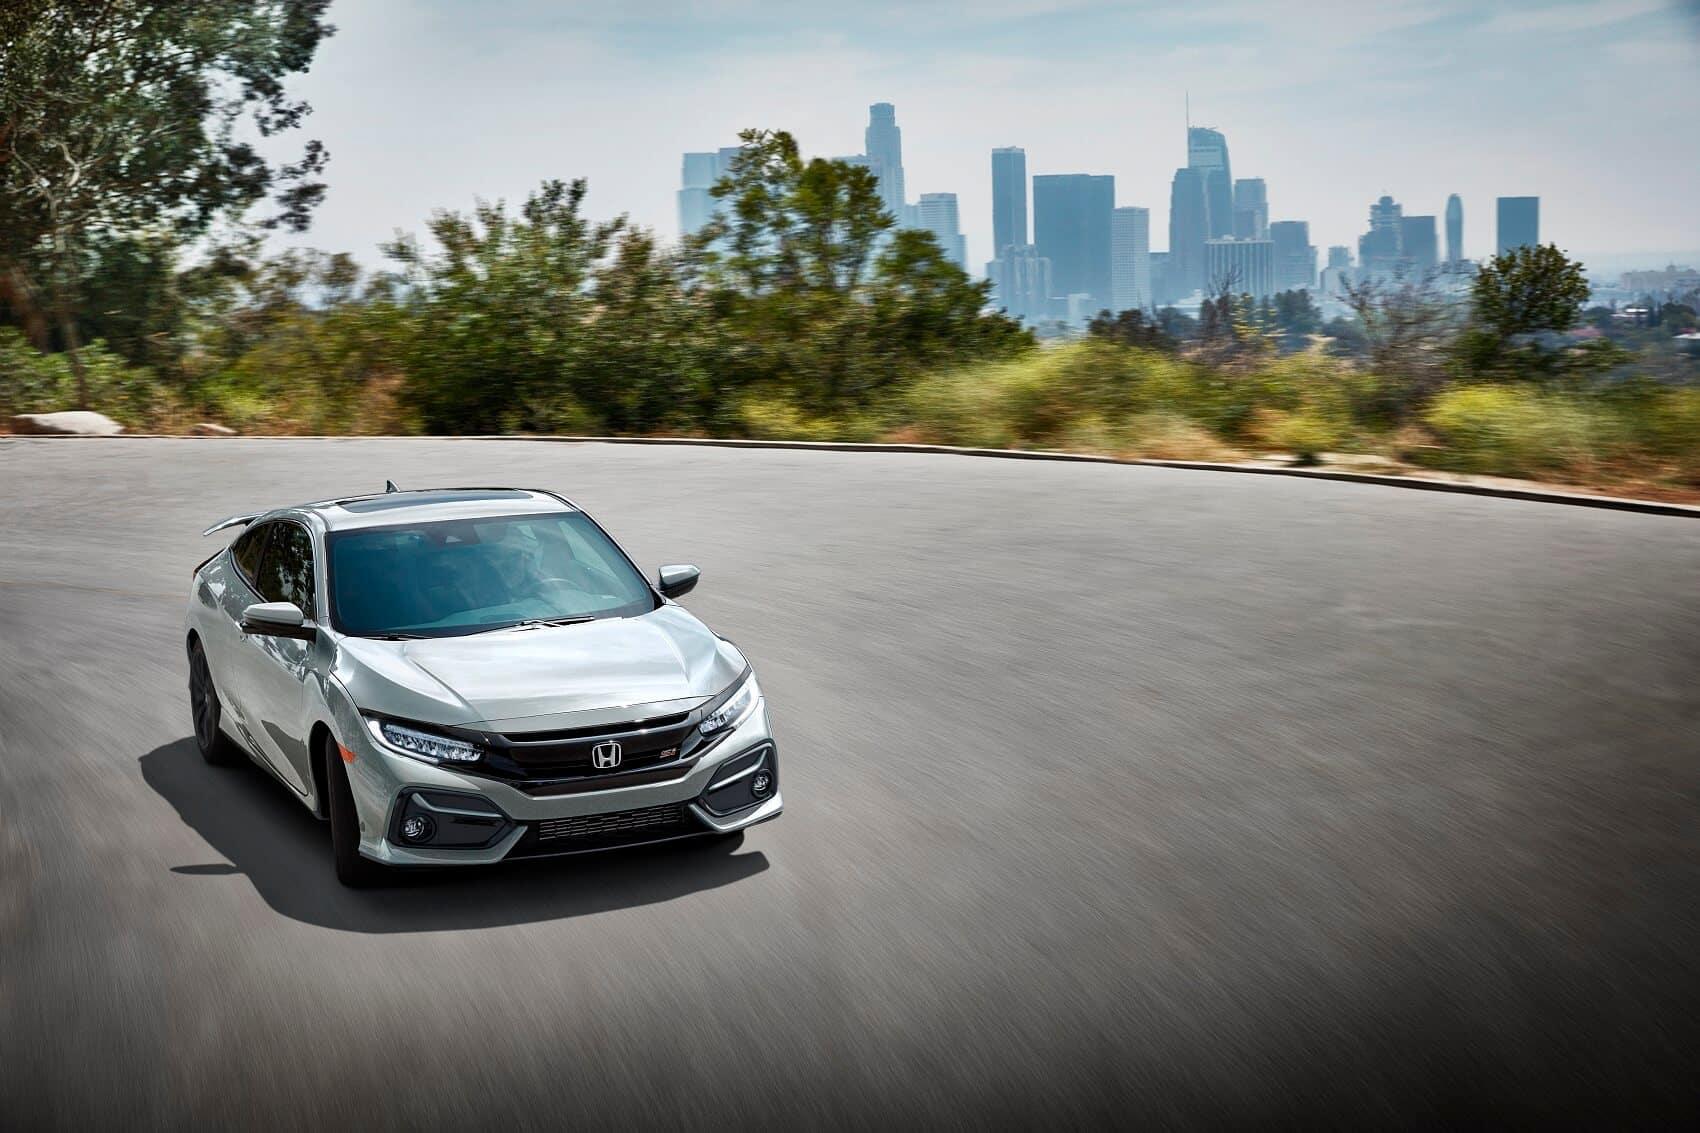 Is the Honda Civic Fuel Efficient?